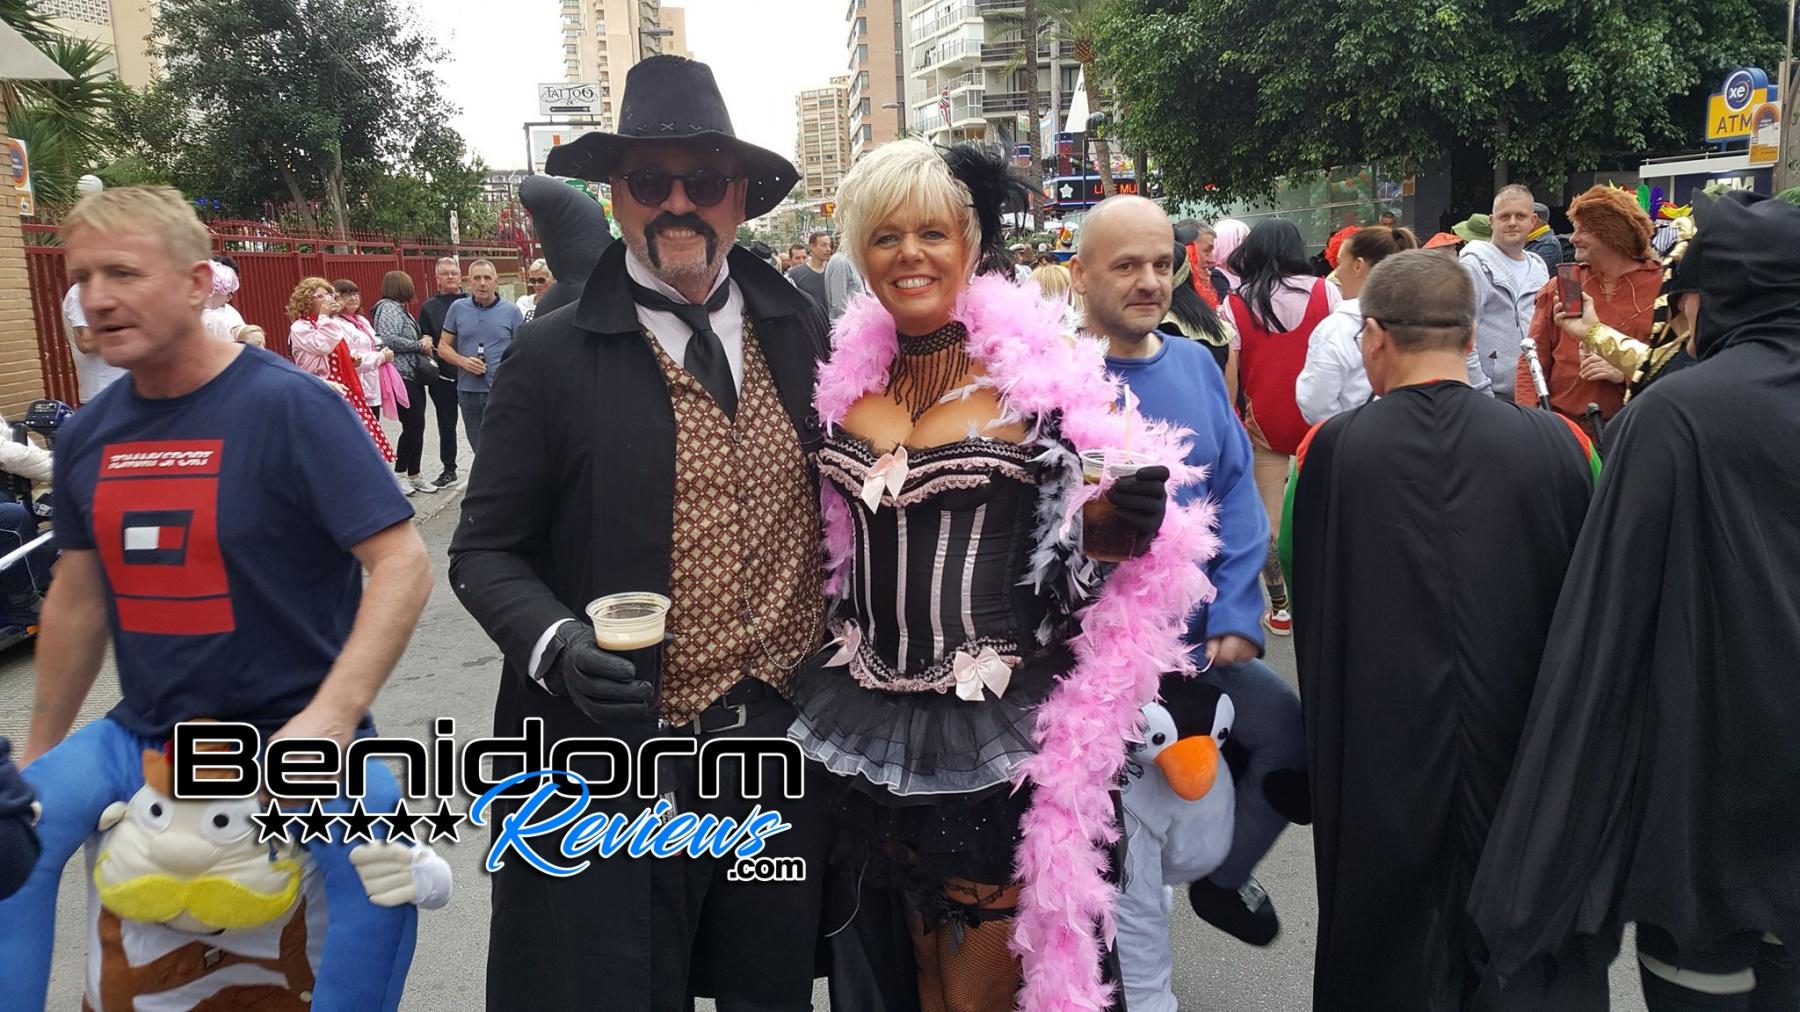 Benidorm-Fiestas-2019-Fancy-Dress-240